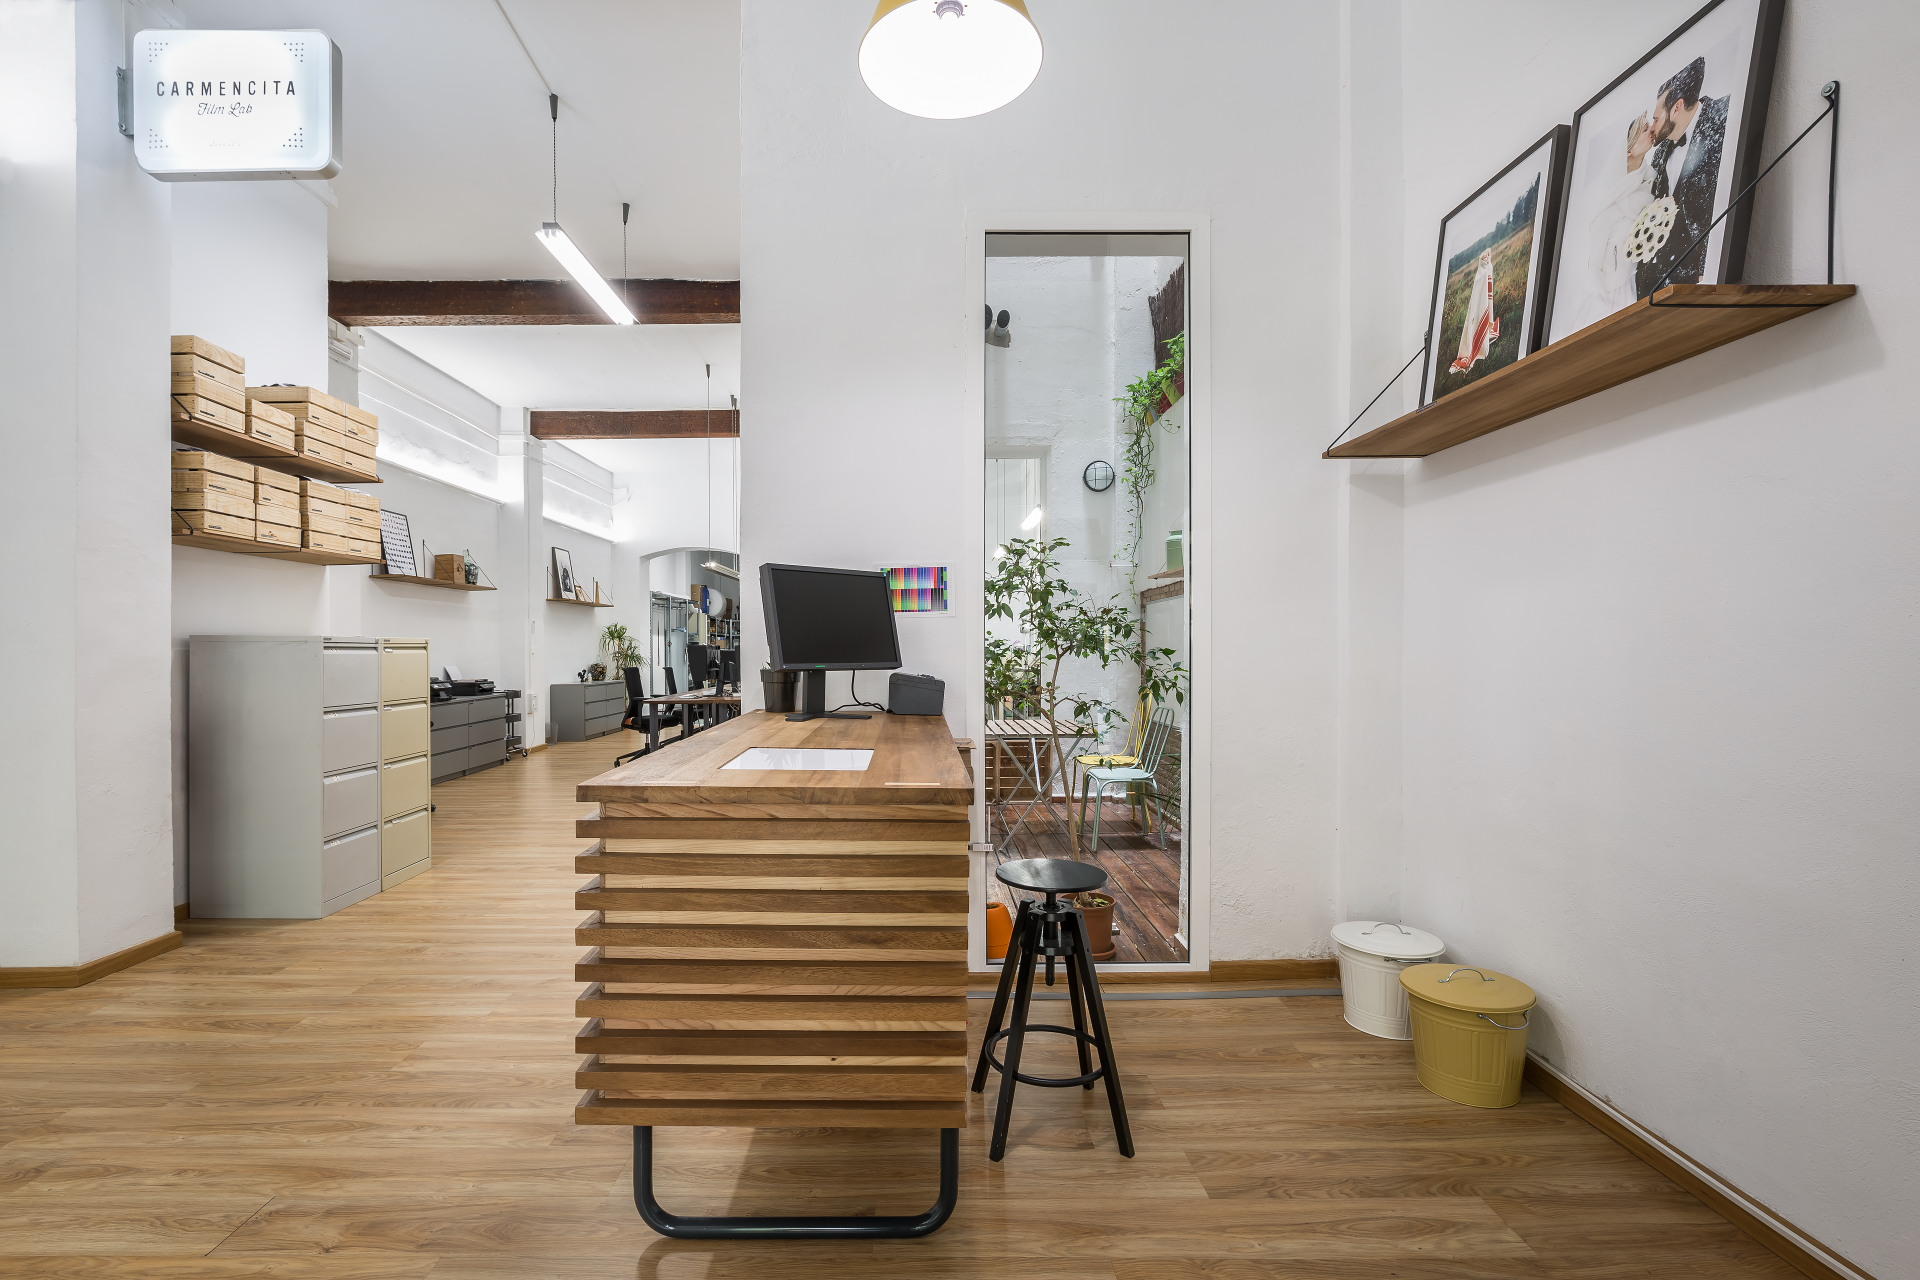 fotografia-arquitectura-interiorismo-valencia-german-cabo-boubau-carmencita-carmencitafilmlab (13)